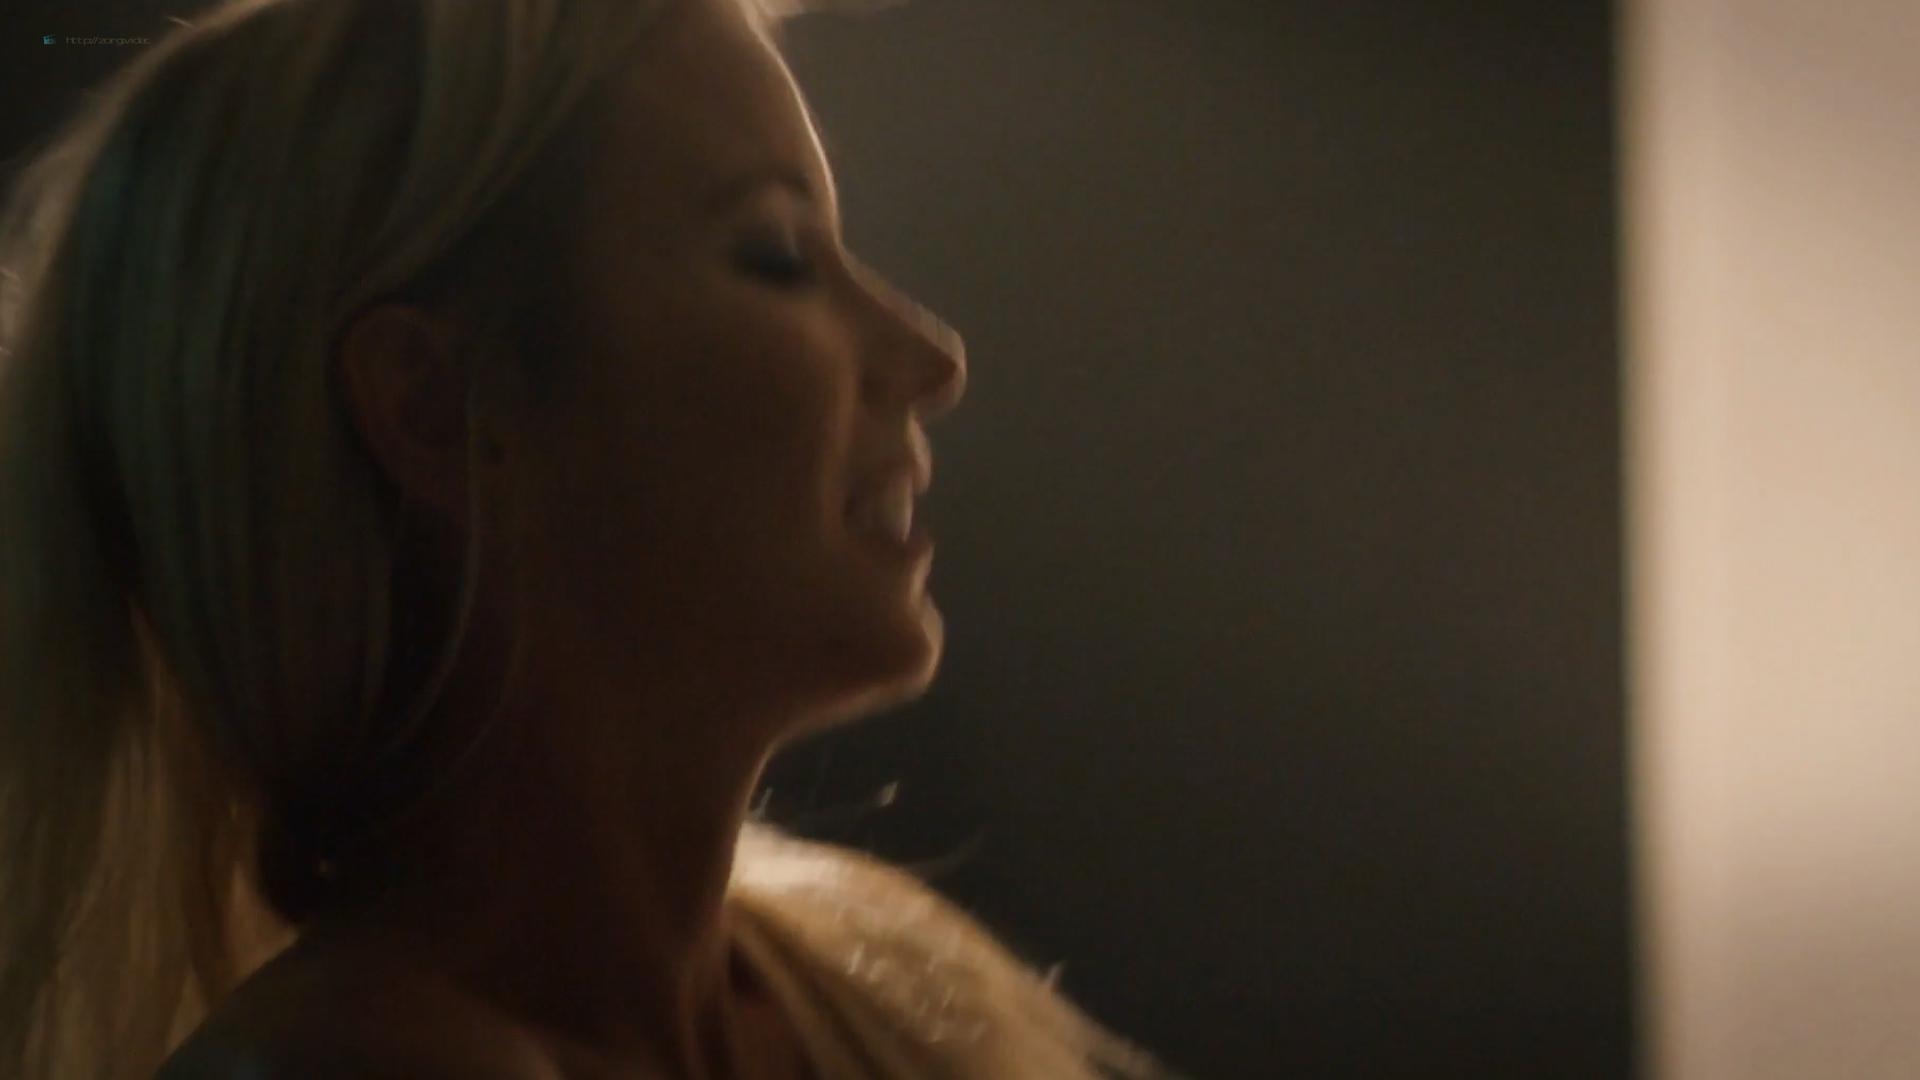 Lee Tomaschefski nude hot sex - 12 Rounds 3: Lockdown (2015) HD 1080p (7)